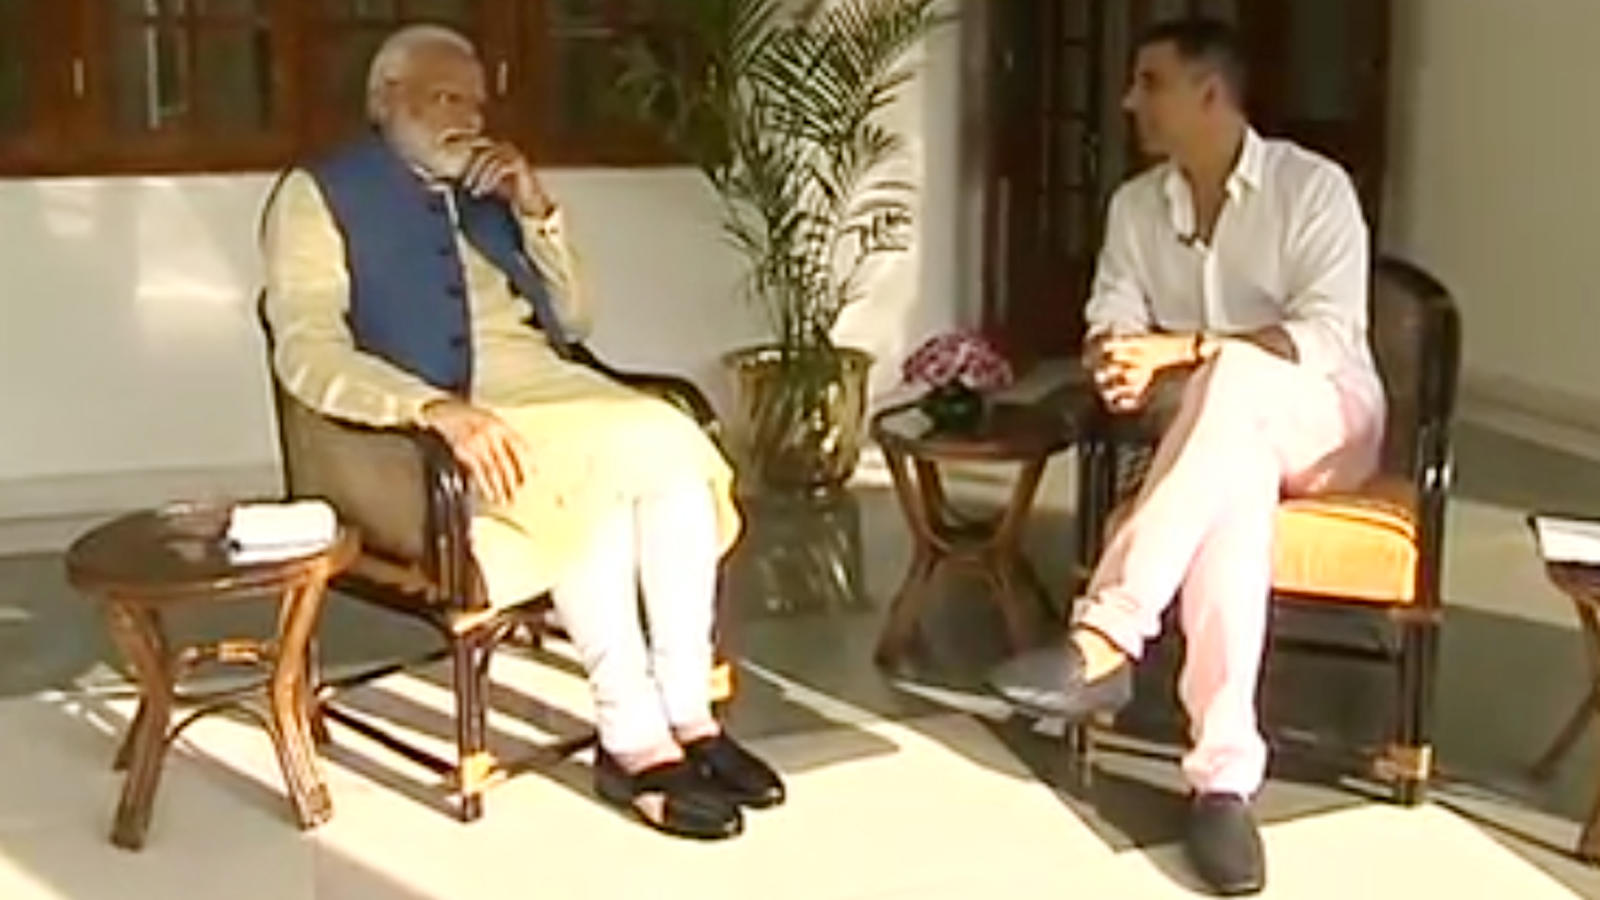 PM Narendra Modi shares his retirement plan with Akshay Kumar